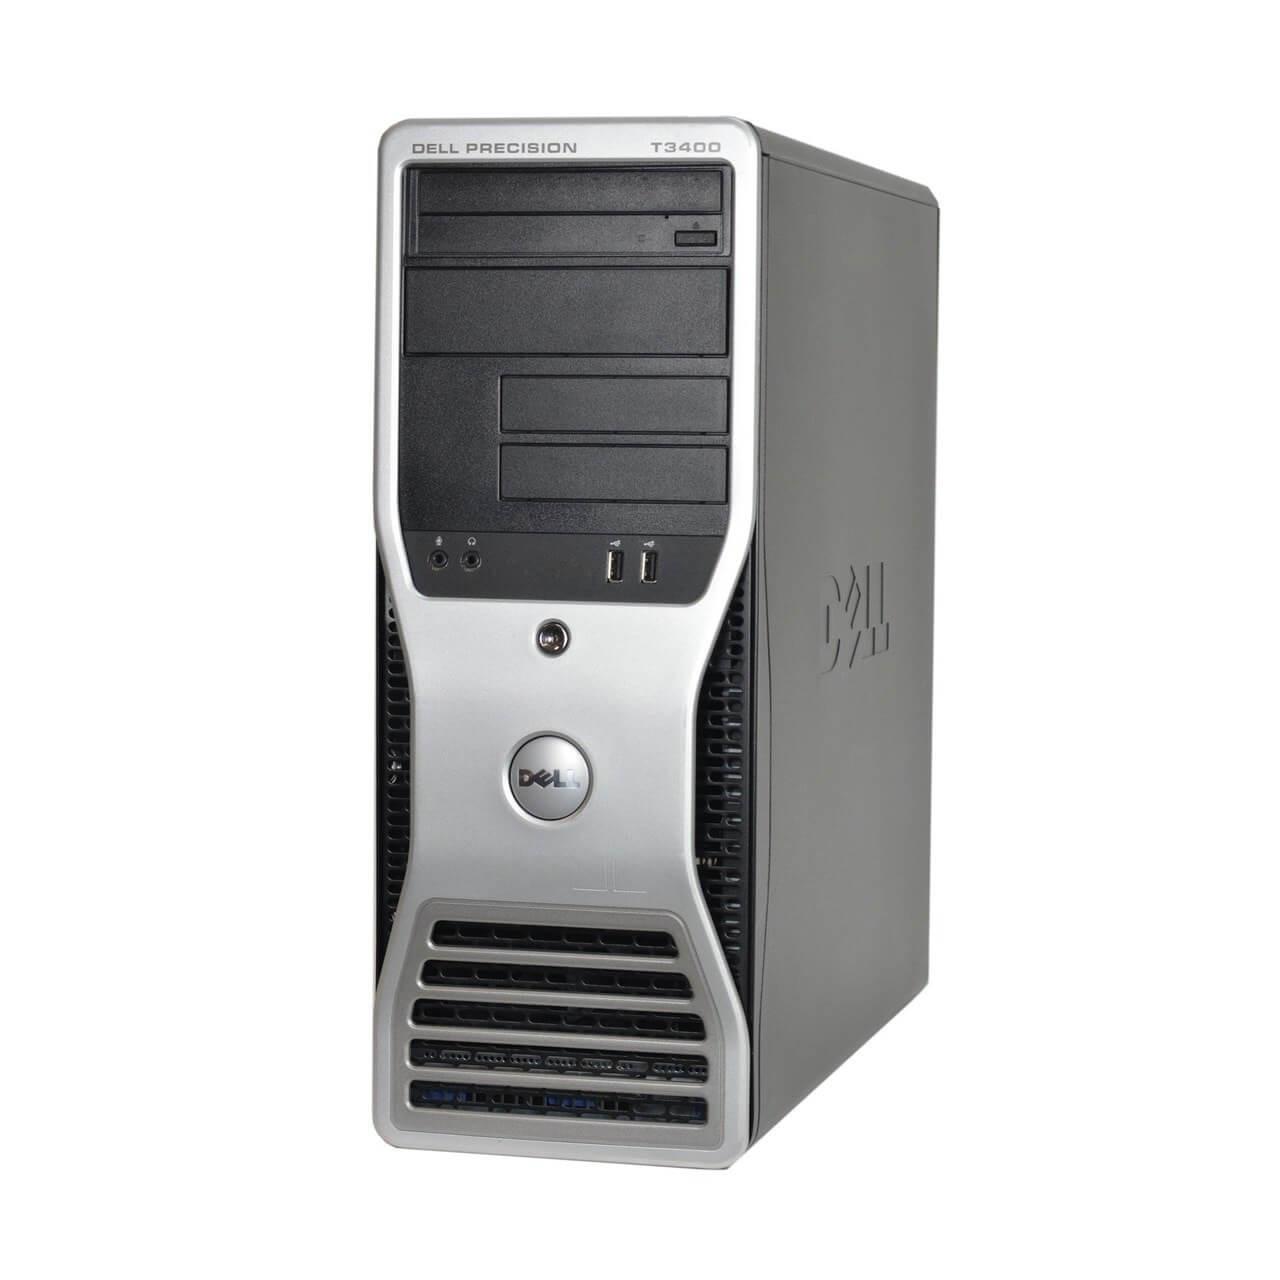 Dell -Precision T3400 Workstation Desktop PC - Intel C2D 2 40 - 4GB Memory  - 500GB Hard Drive- No Windows